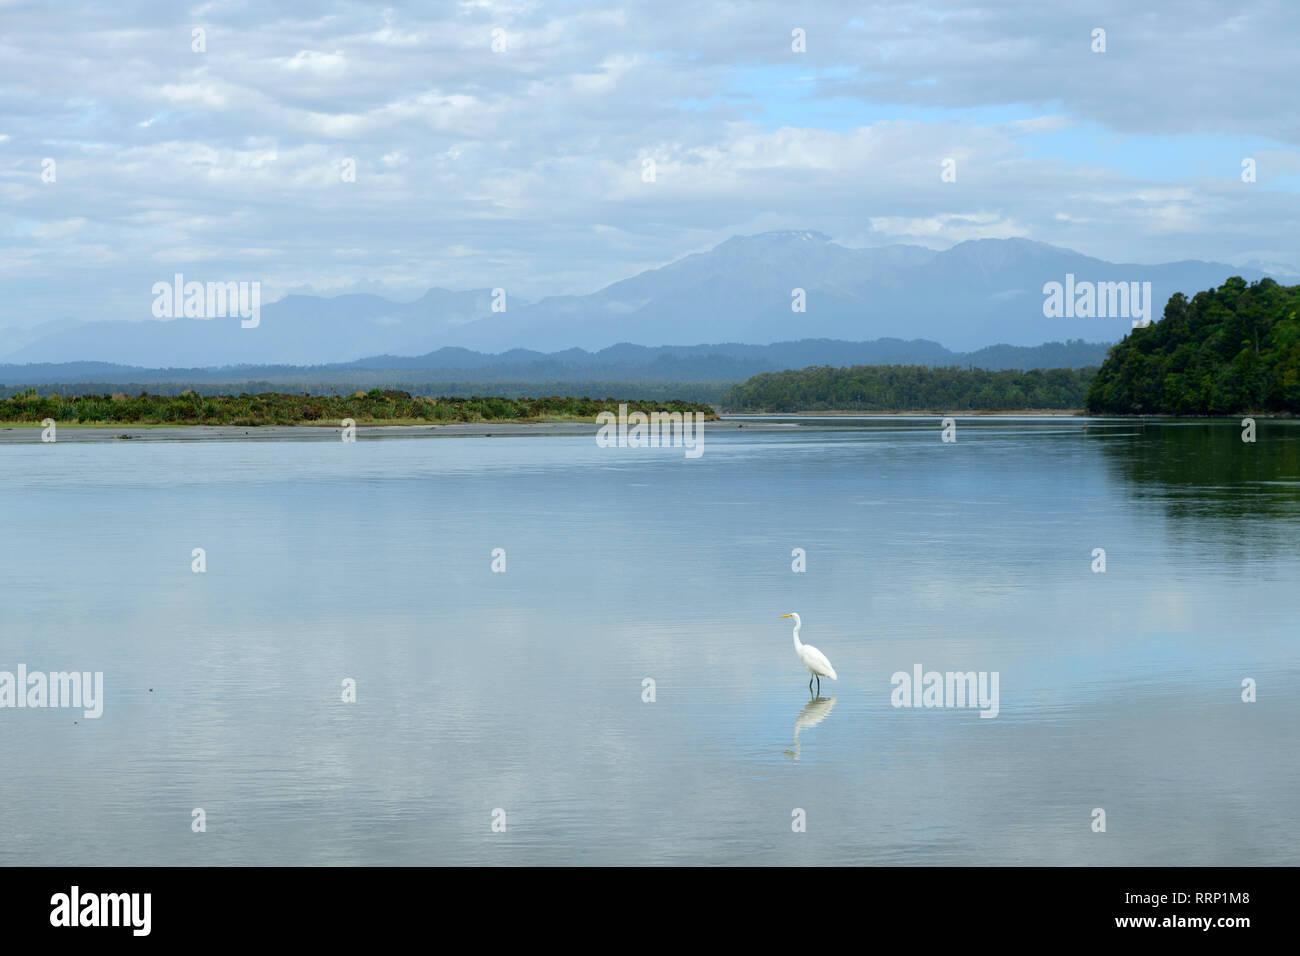 Oceania, New Zealand, Aotearoa, South Island, West Coast, Okarito Lagune, Egret - Stock Image